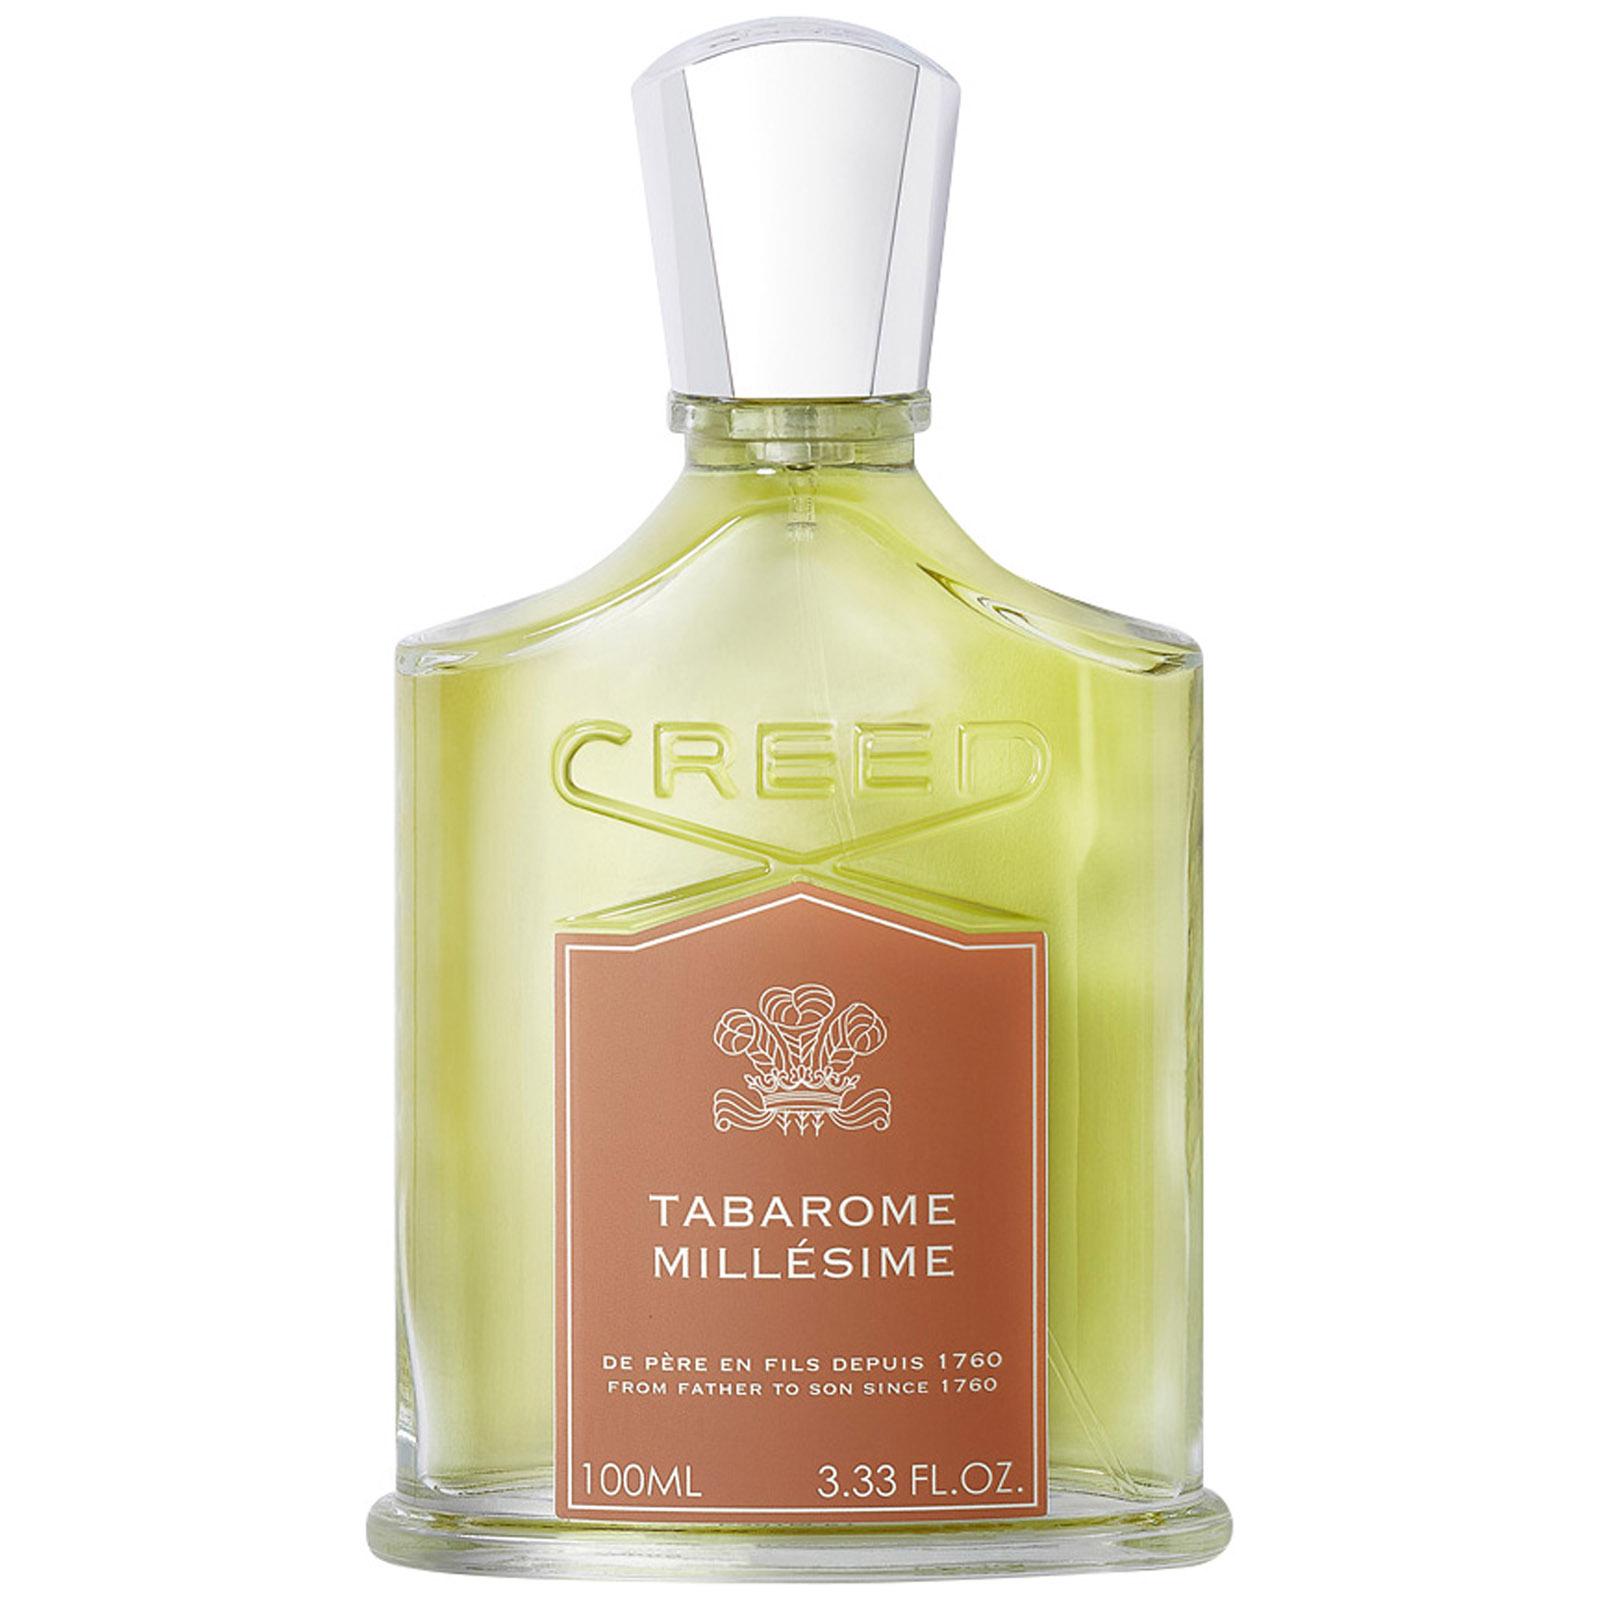 Creed Tabarome Perfume Eau De Parfum 100 ml In White